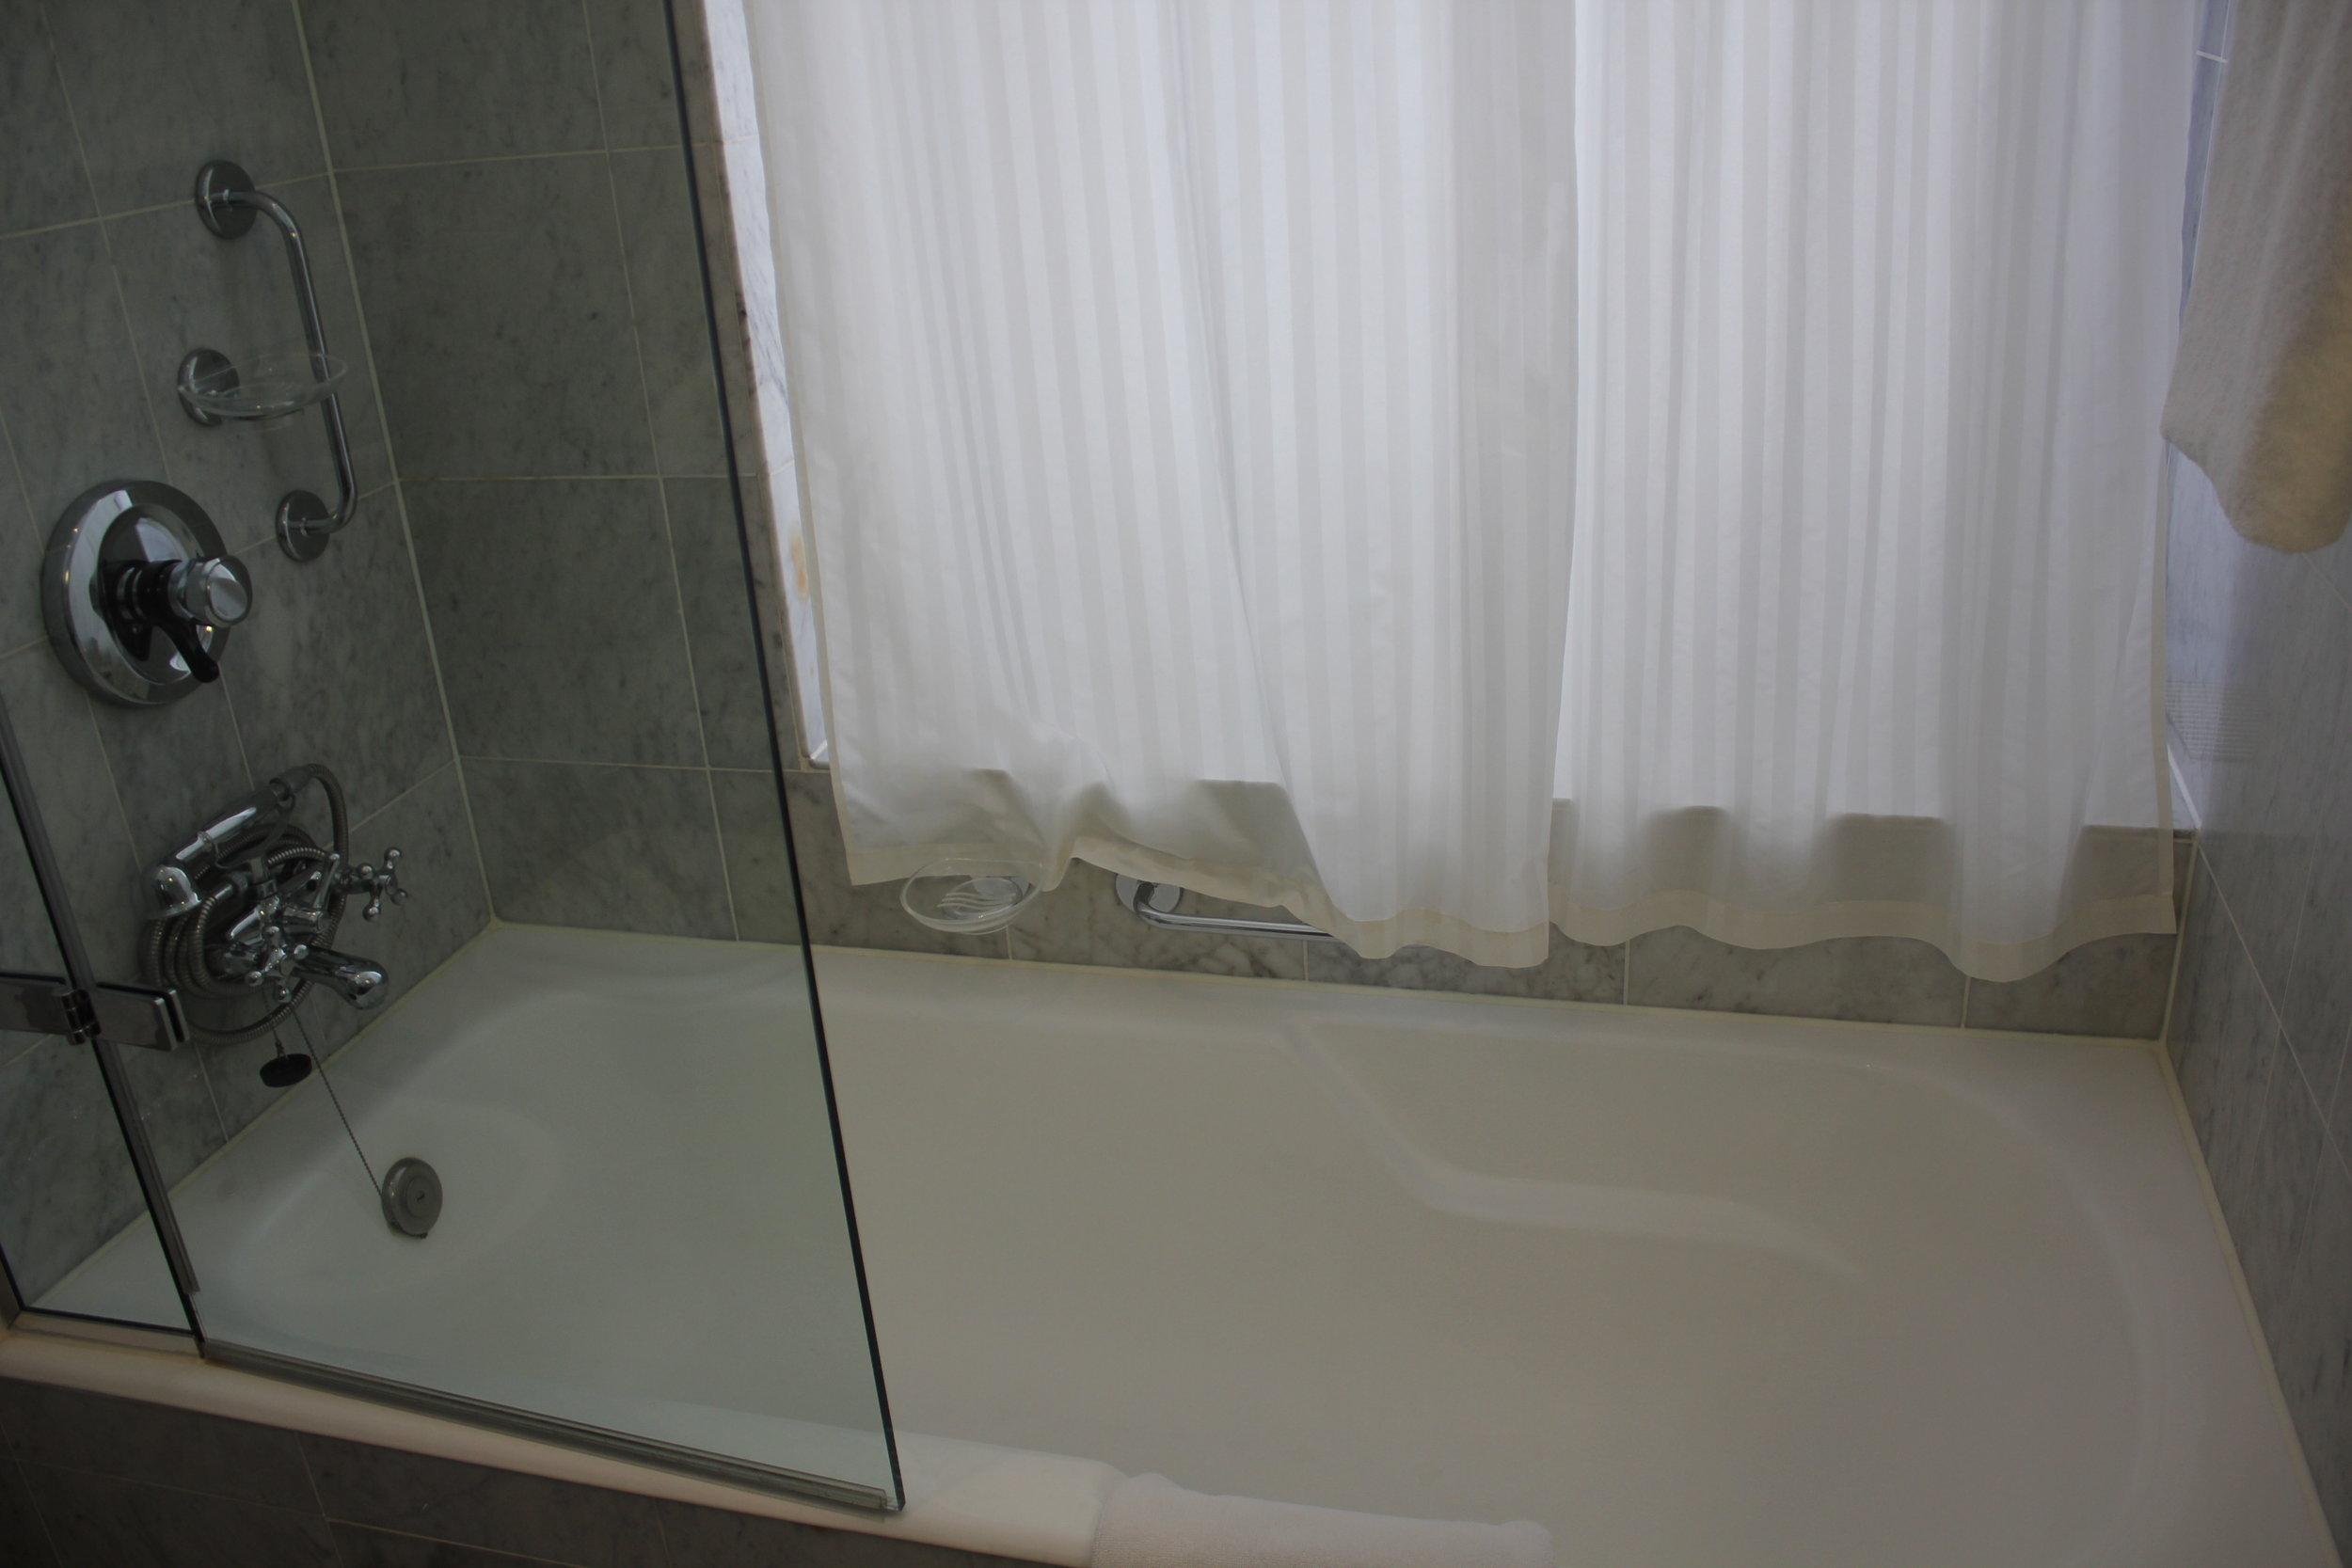 Hotel Bristol Warsaw – Shower/tub combo